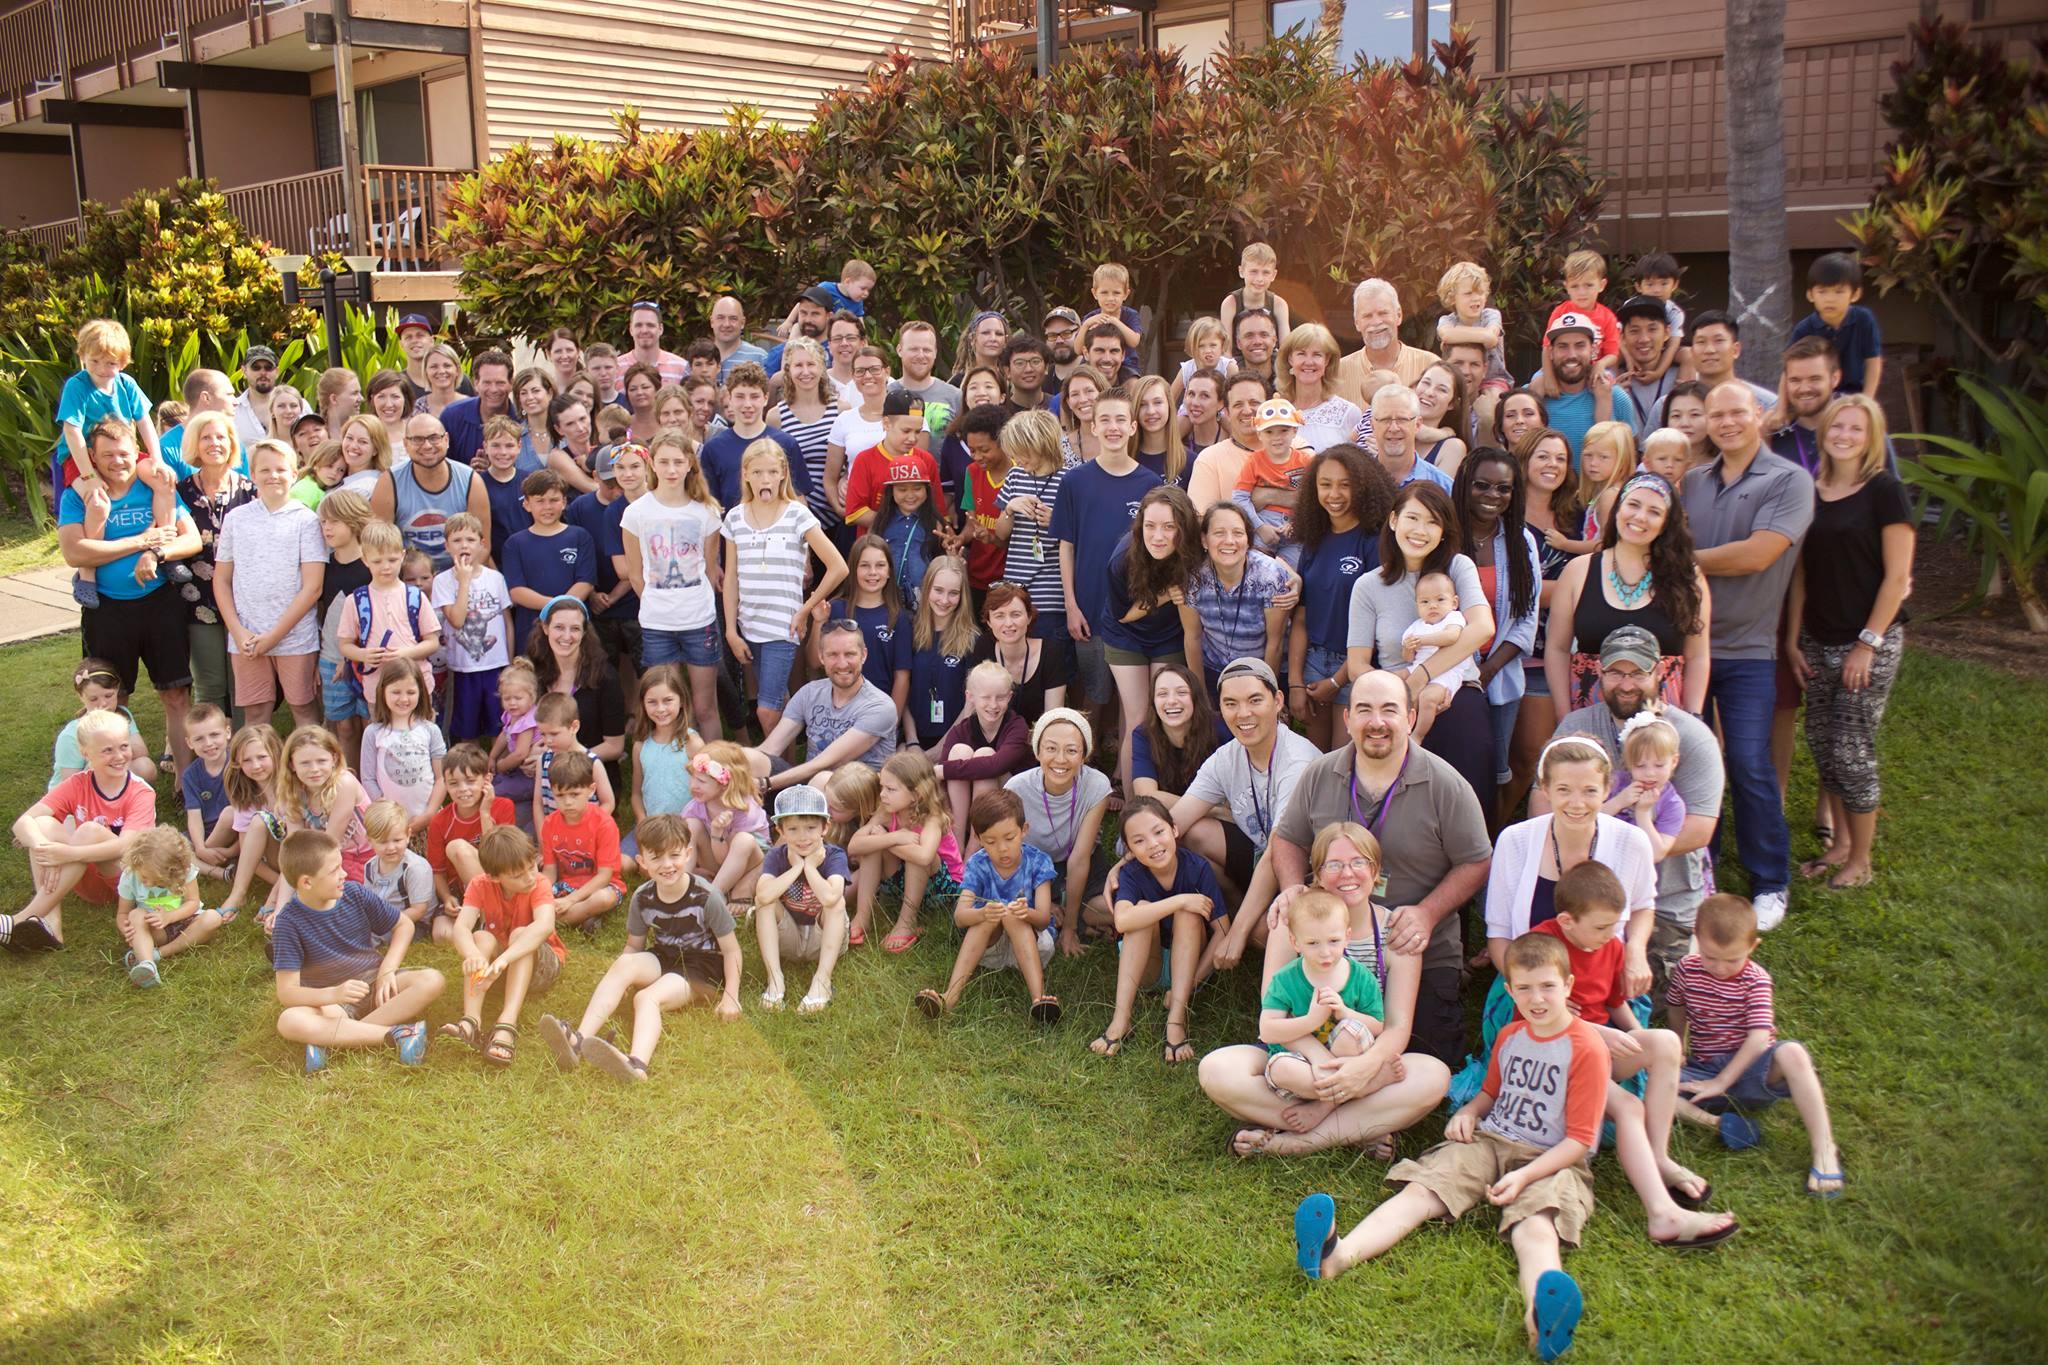 Family DTS, Hawaii (Sept 2018) – YWAM Family Ministries